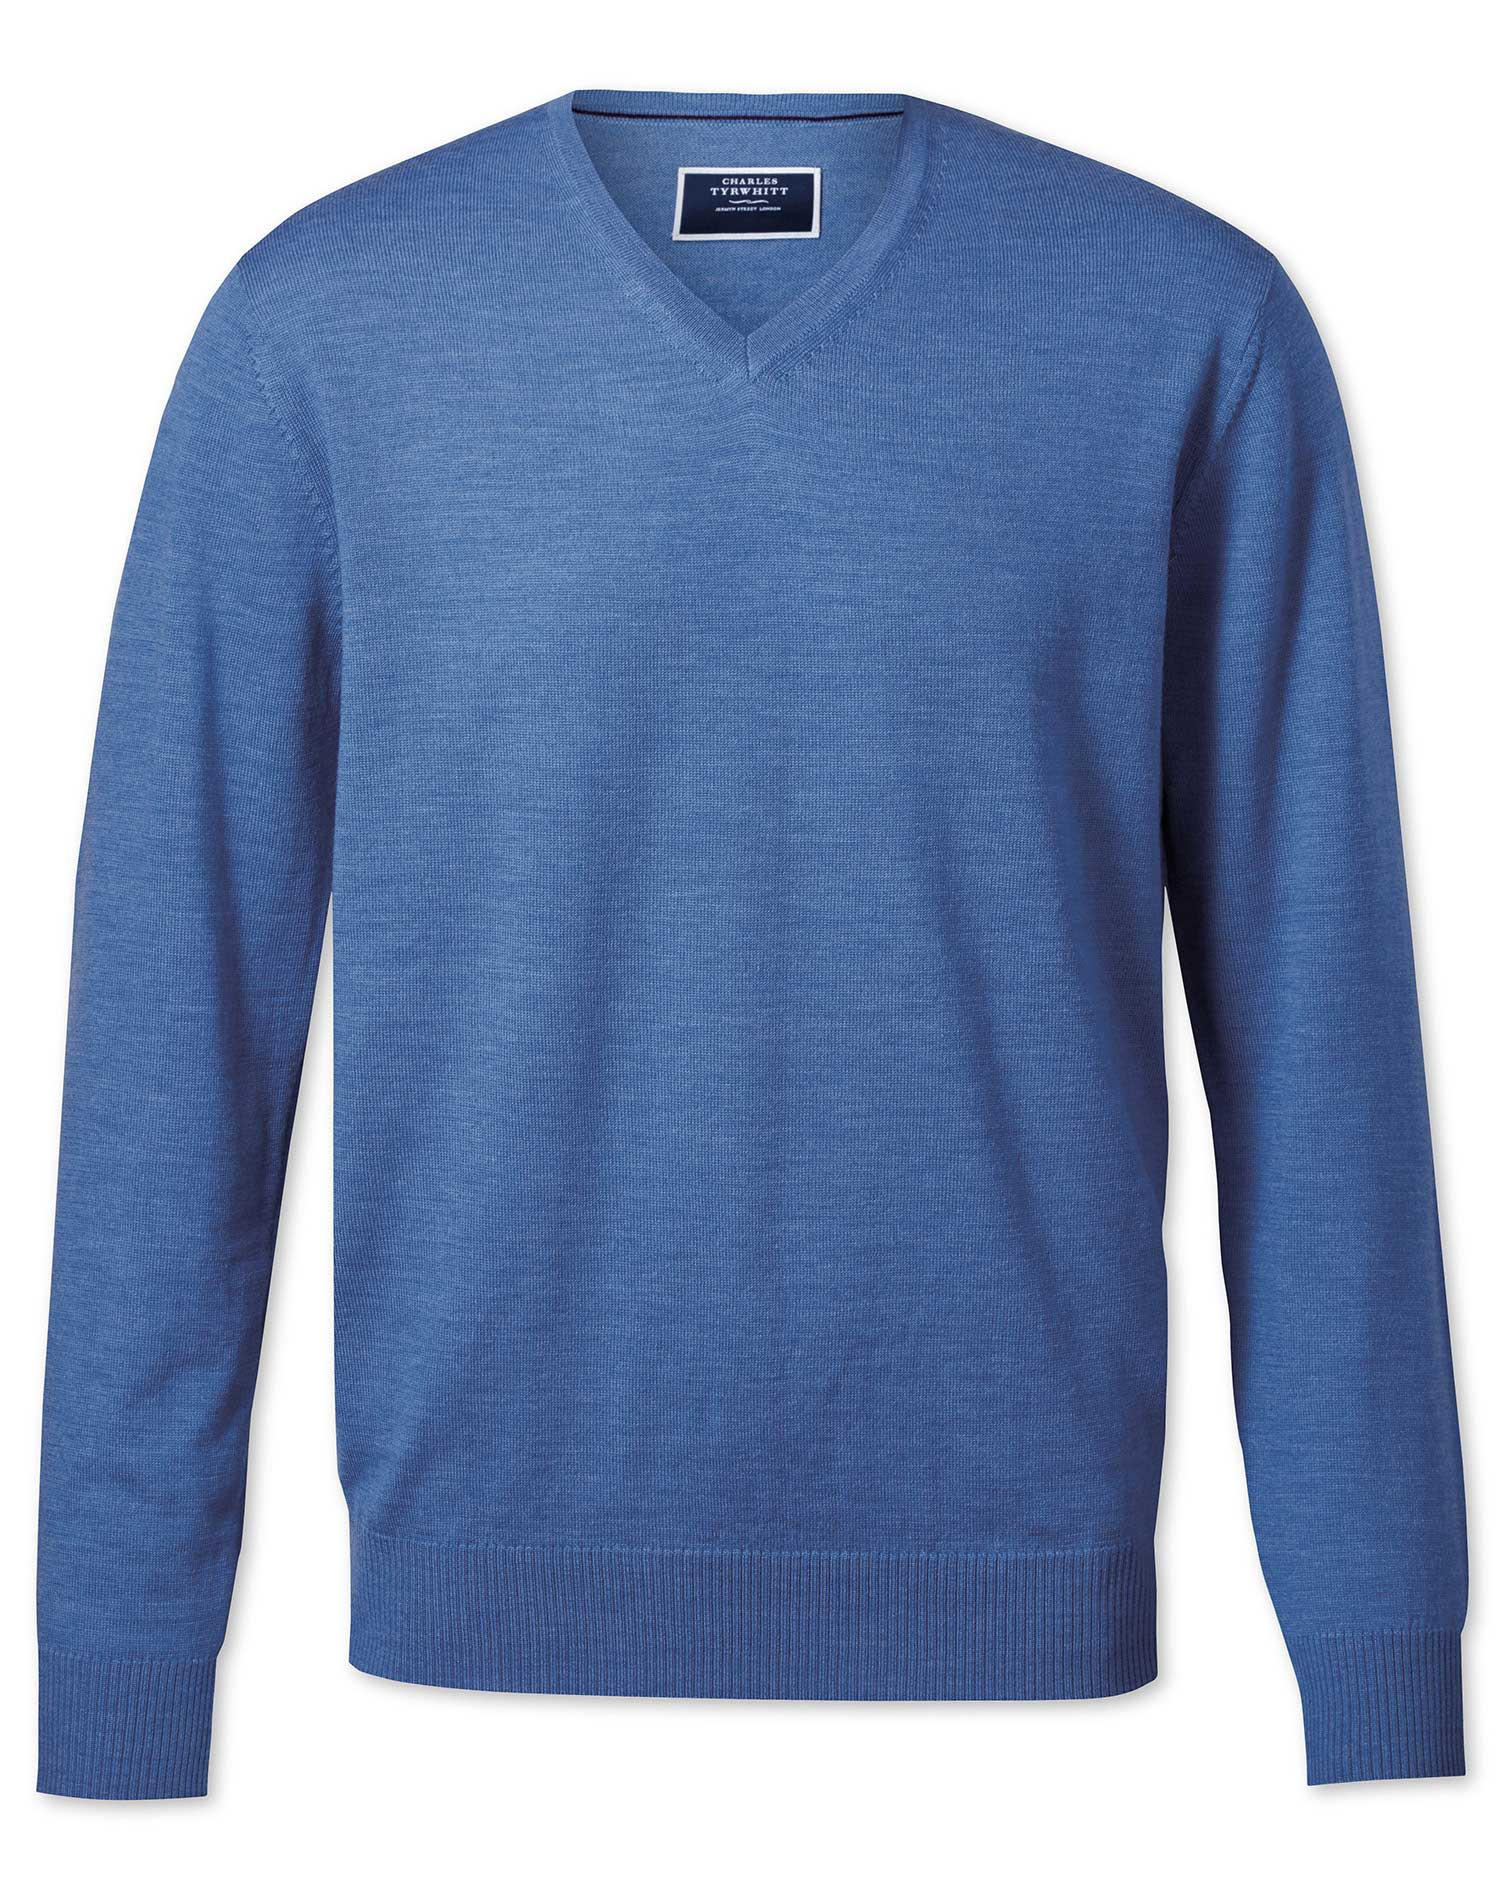 Blue Merino Wool V-Neck Jumper Size Medium by Charles Tyrwhitt